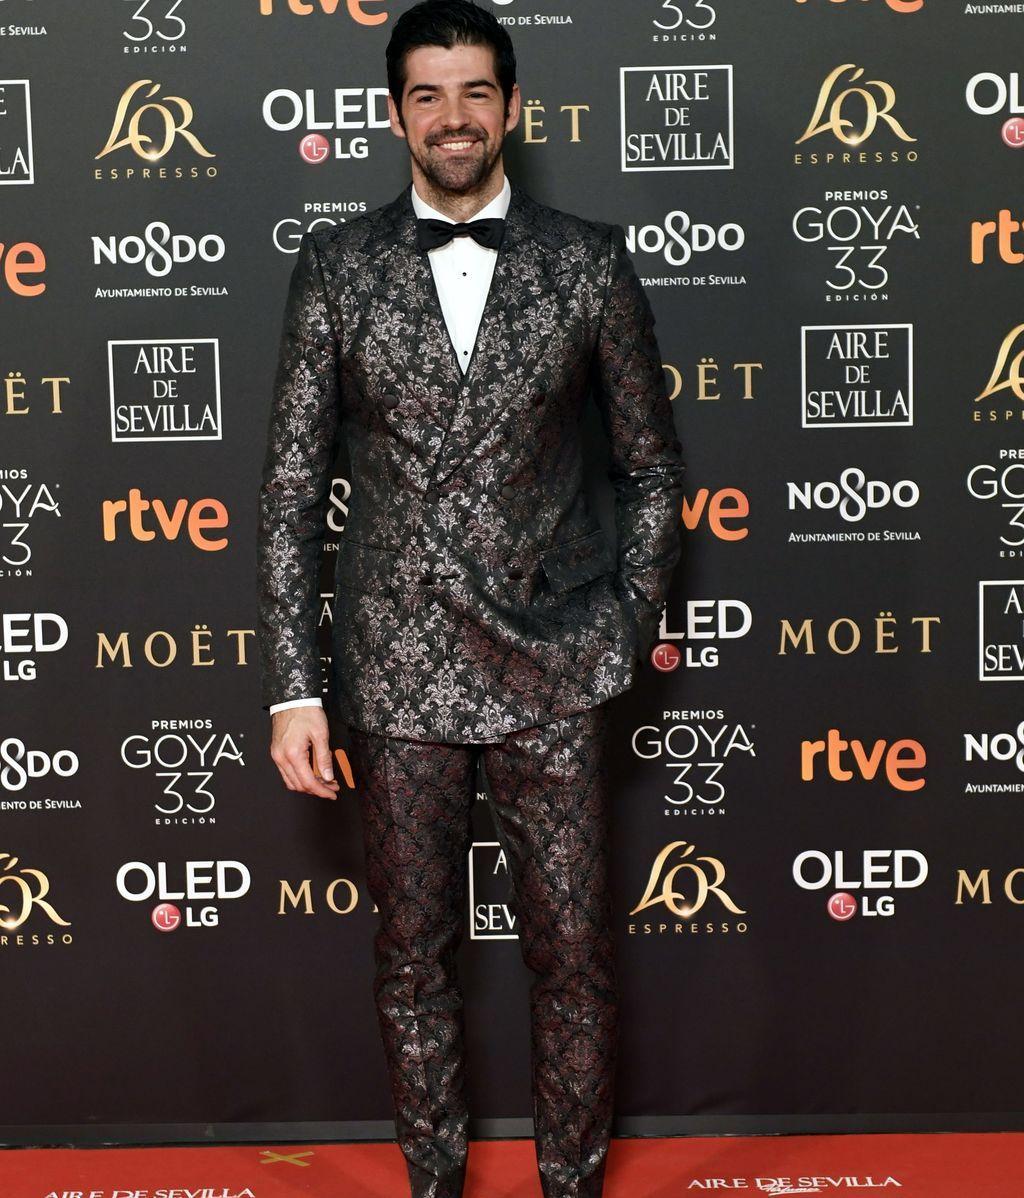 Miguel Angel Muñoz de Dolce & Gabbana